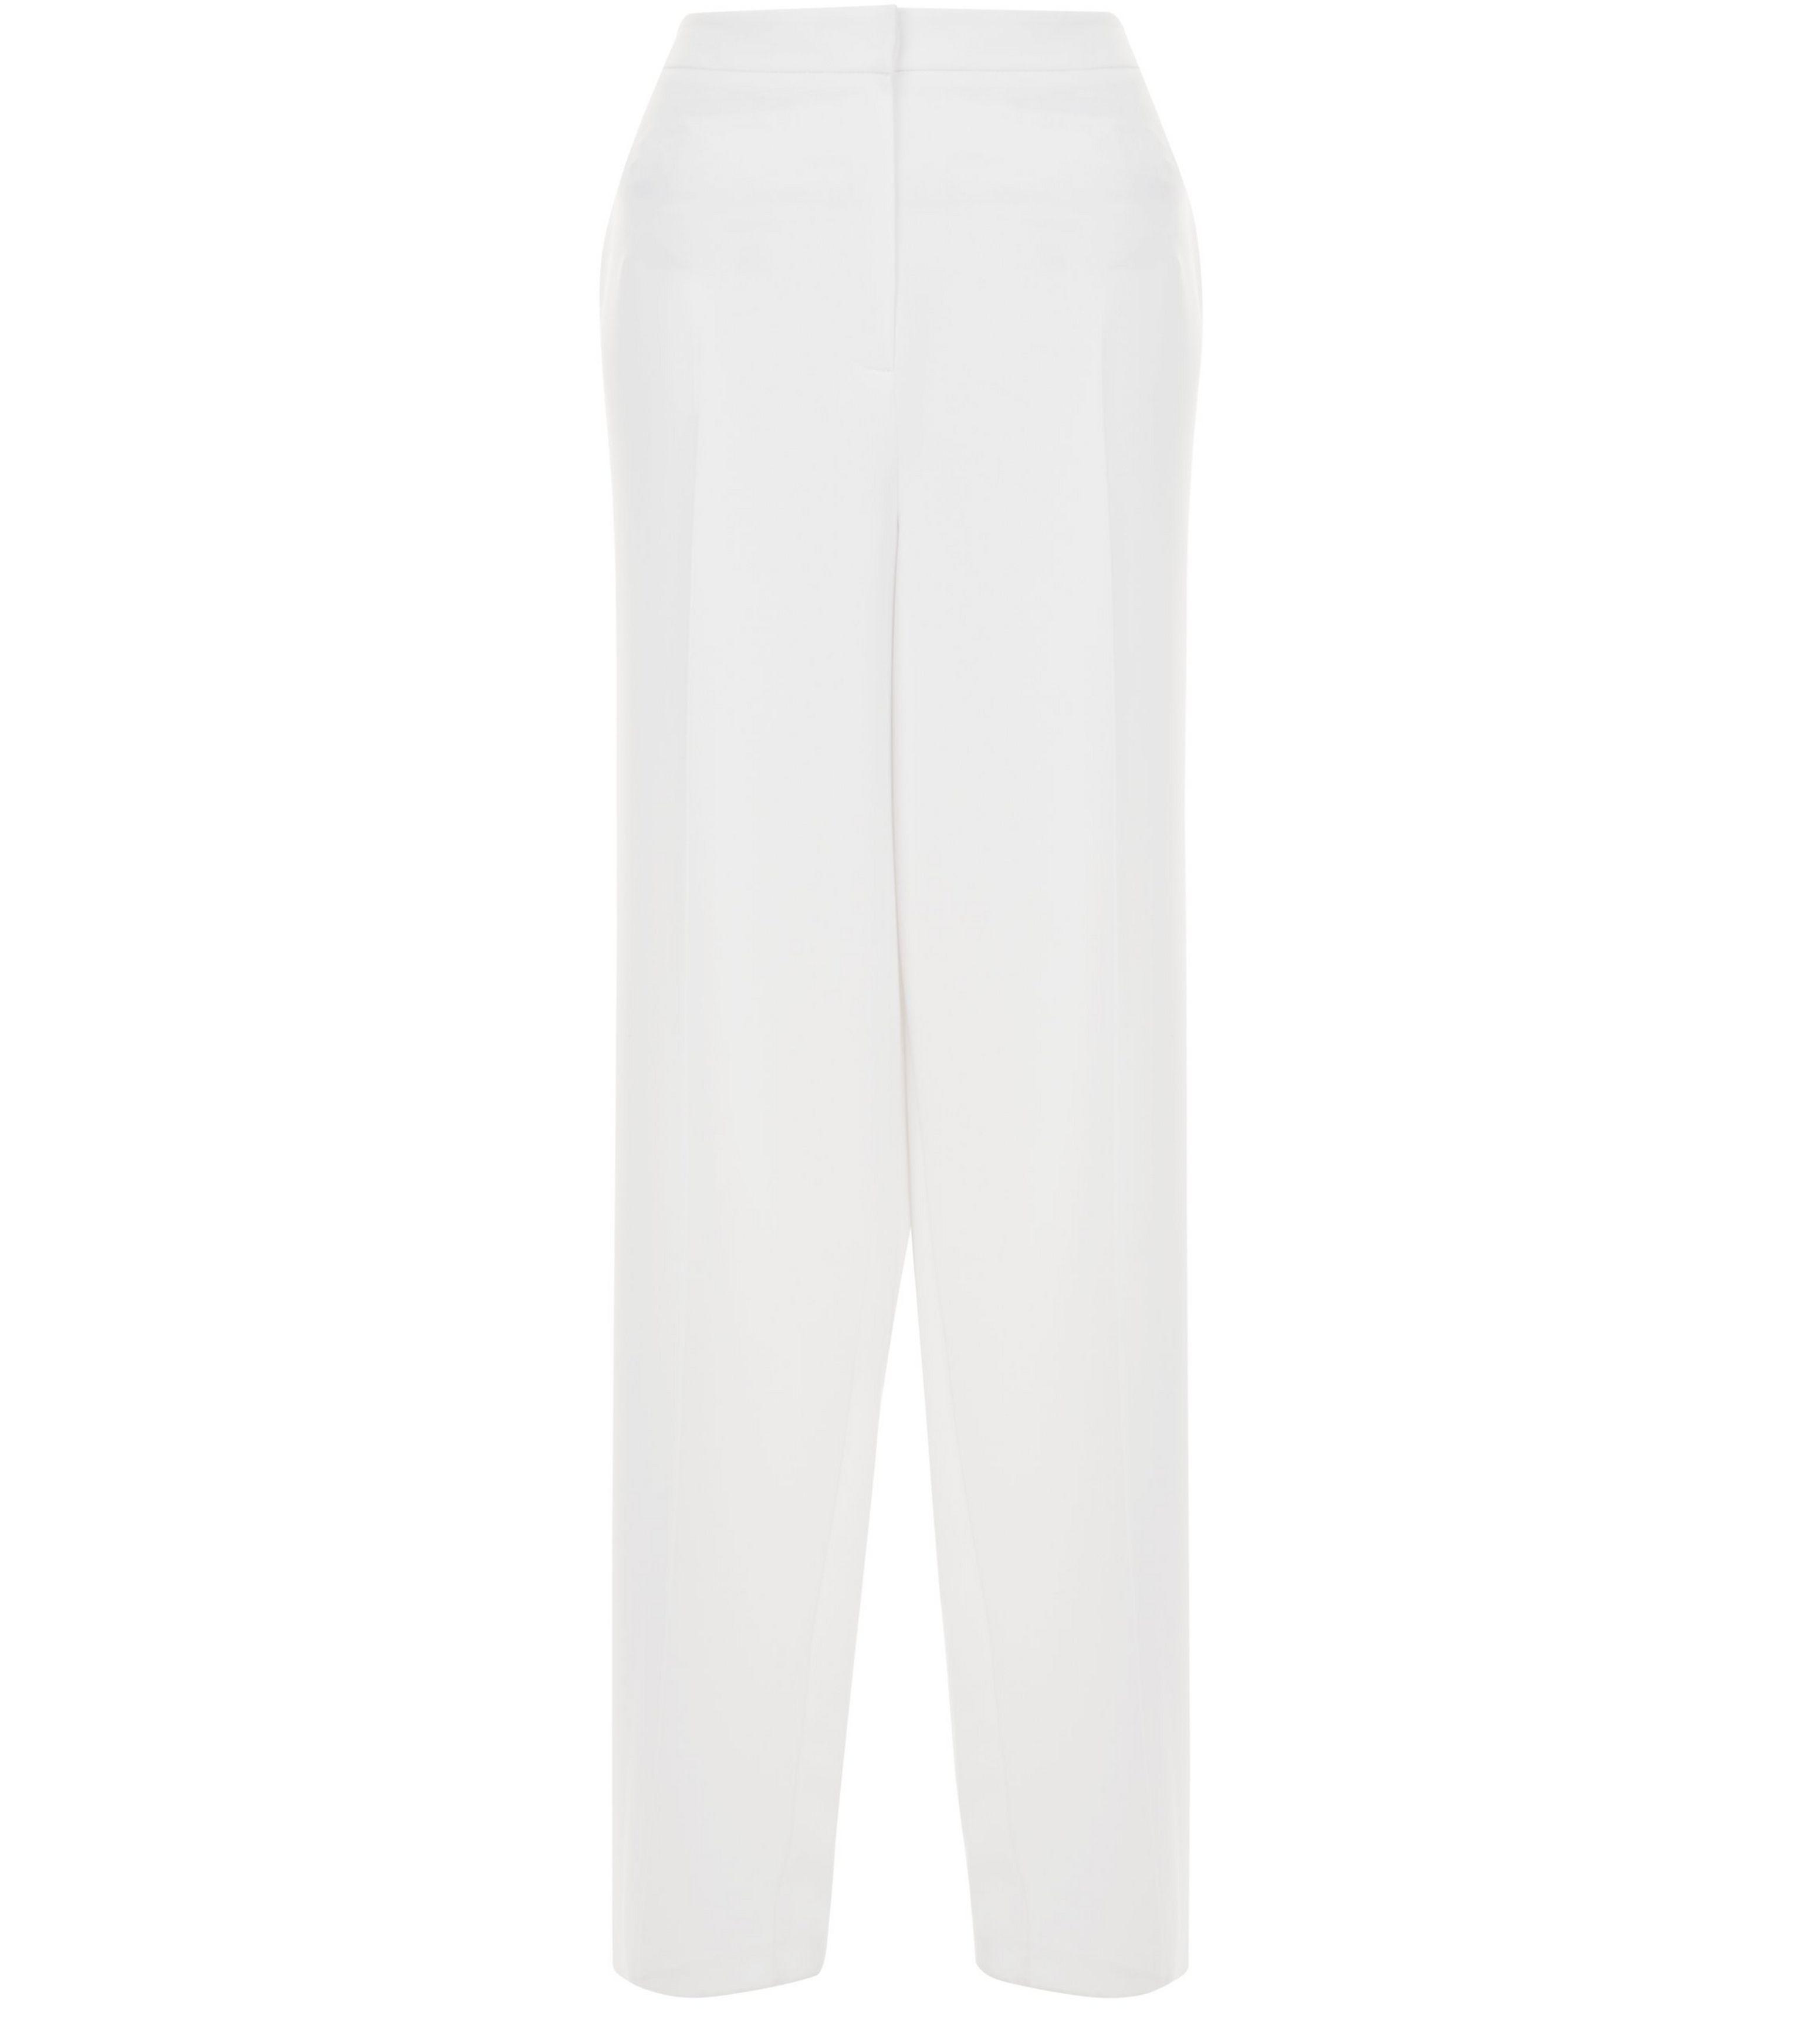 pantalon blanc new look destination seventies elle. Black Bedroom Furniture Sets. Home Design Ideas